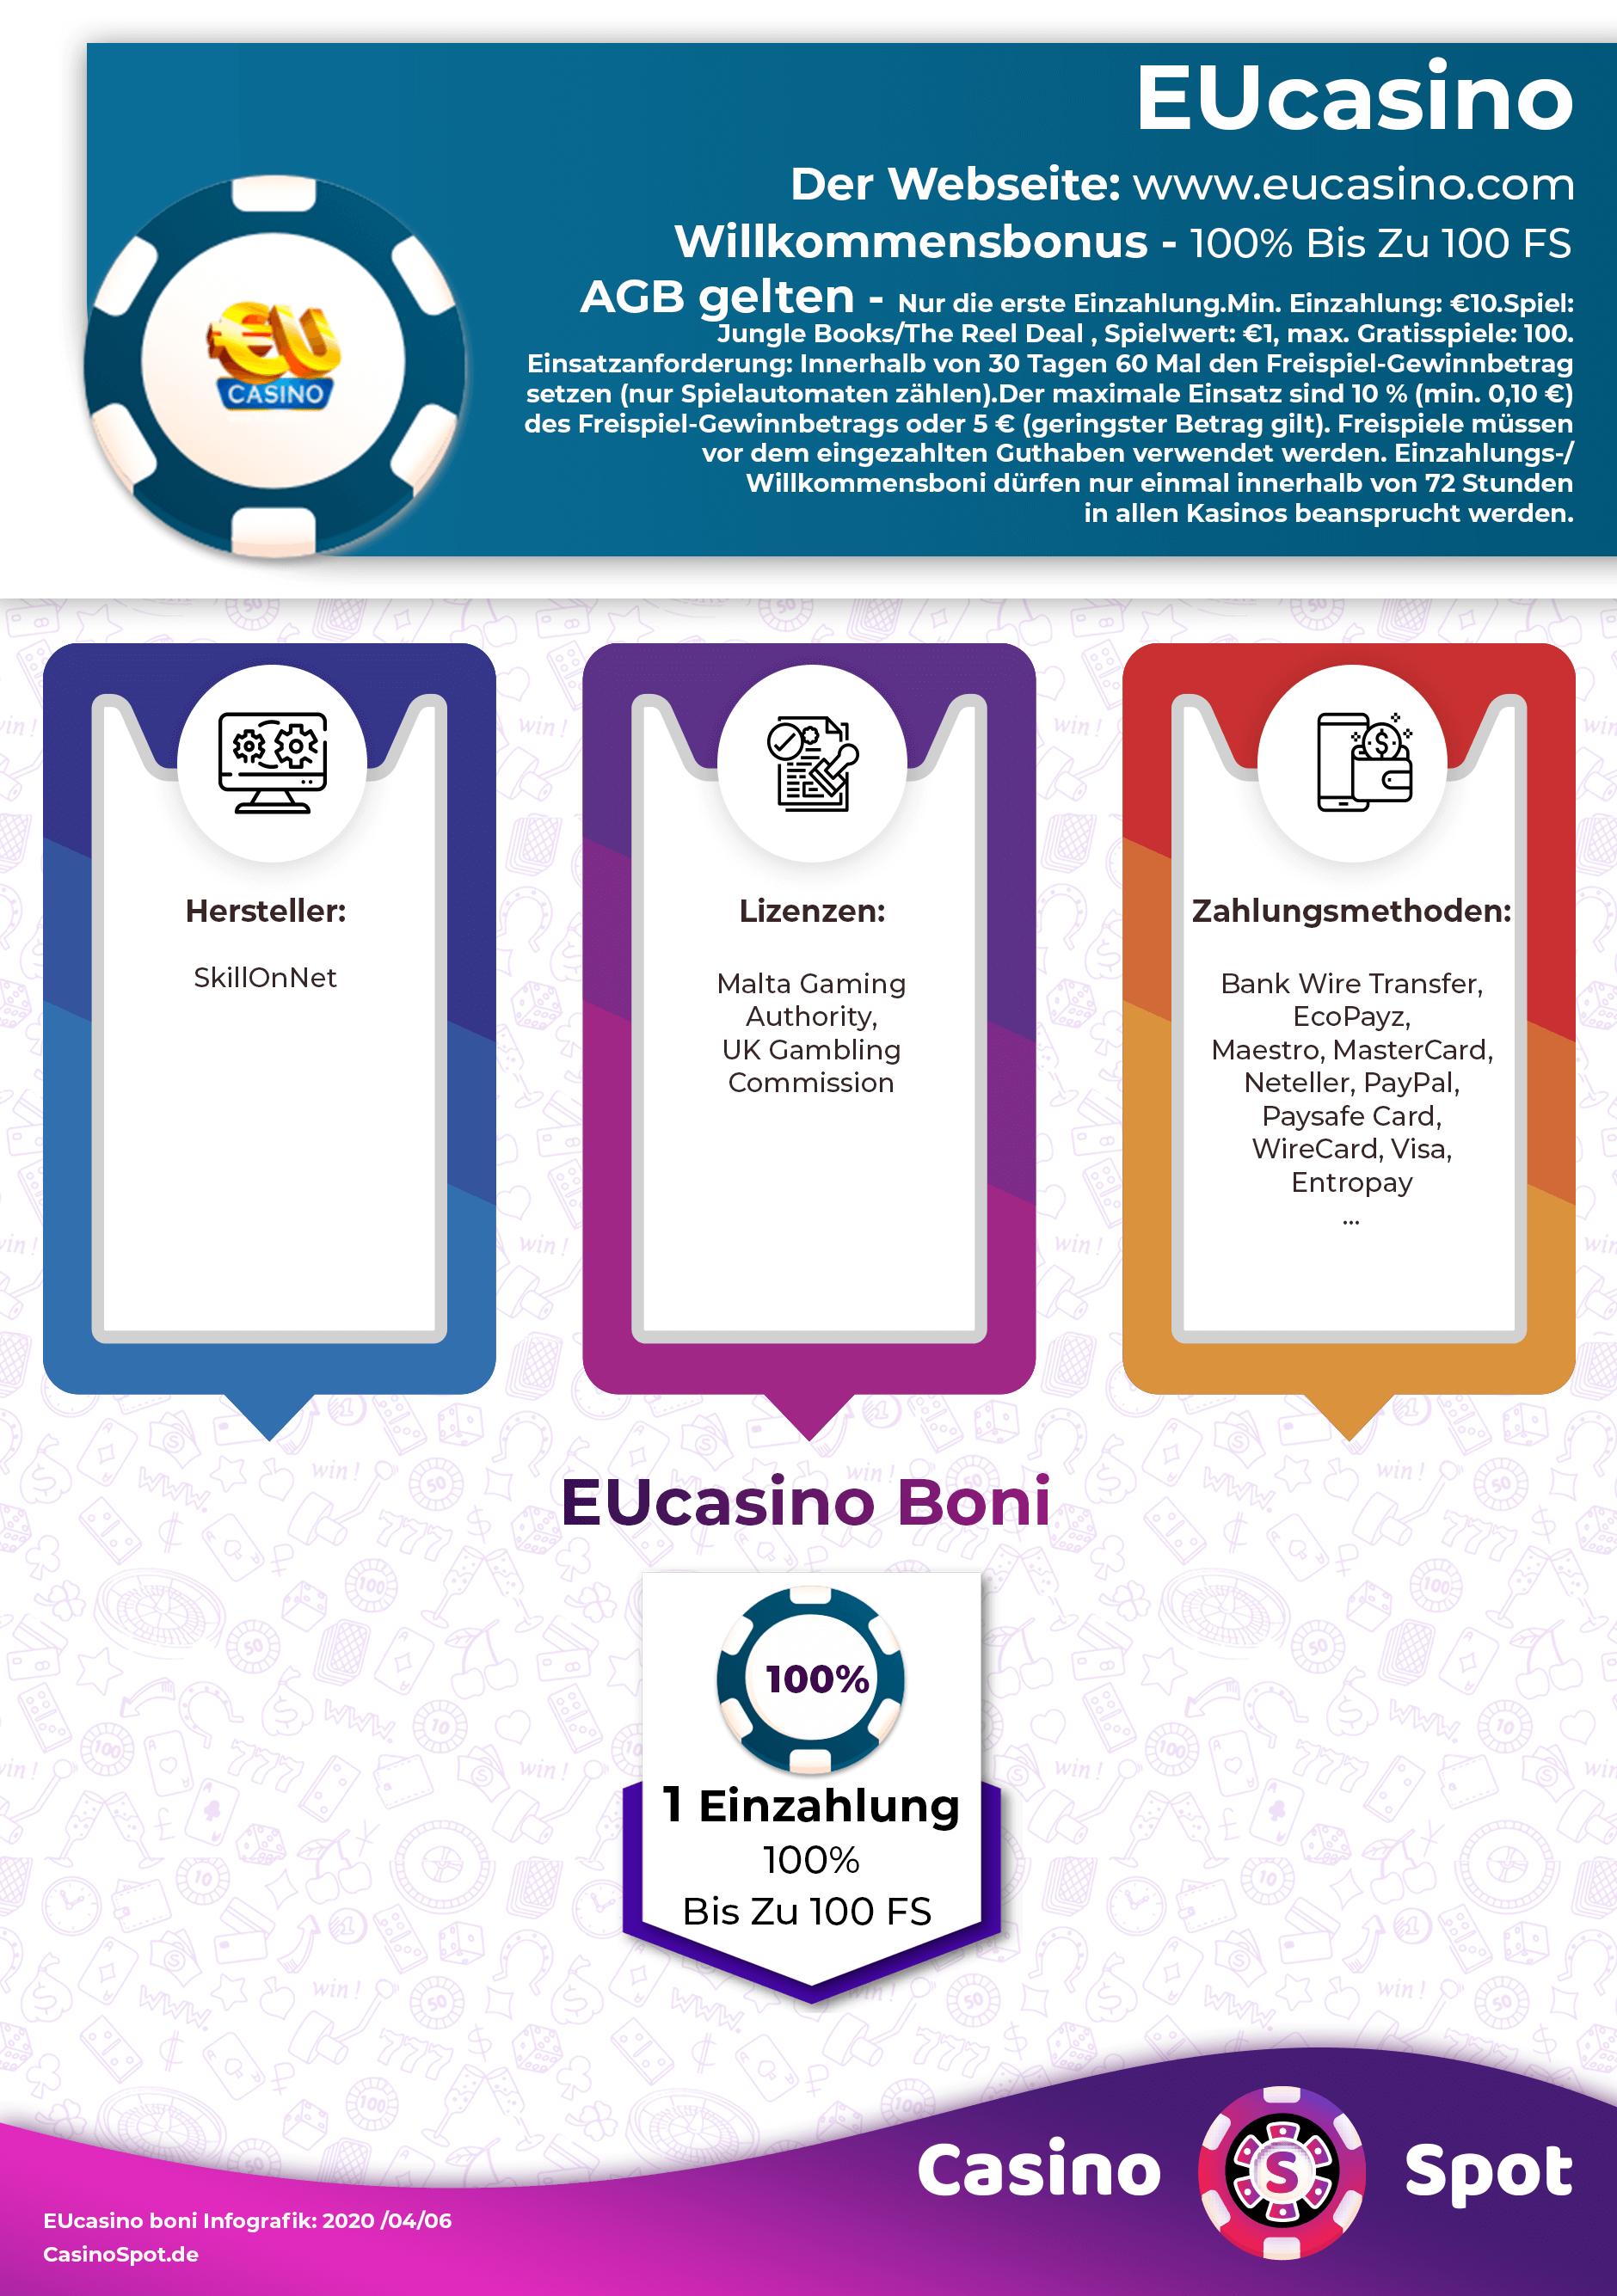 Eu Casino Bonus Code Ohne Einzahlung